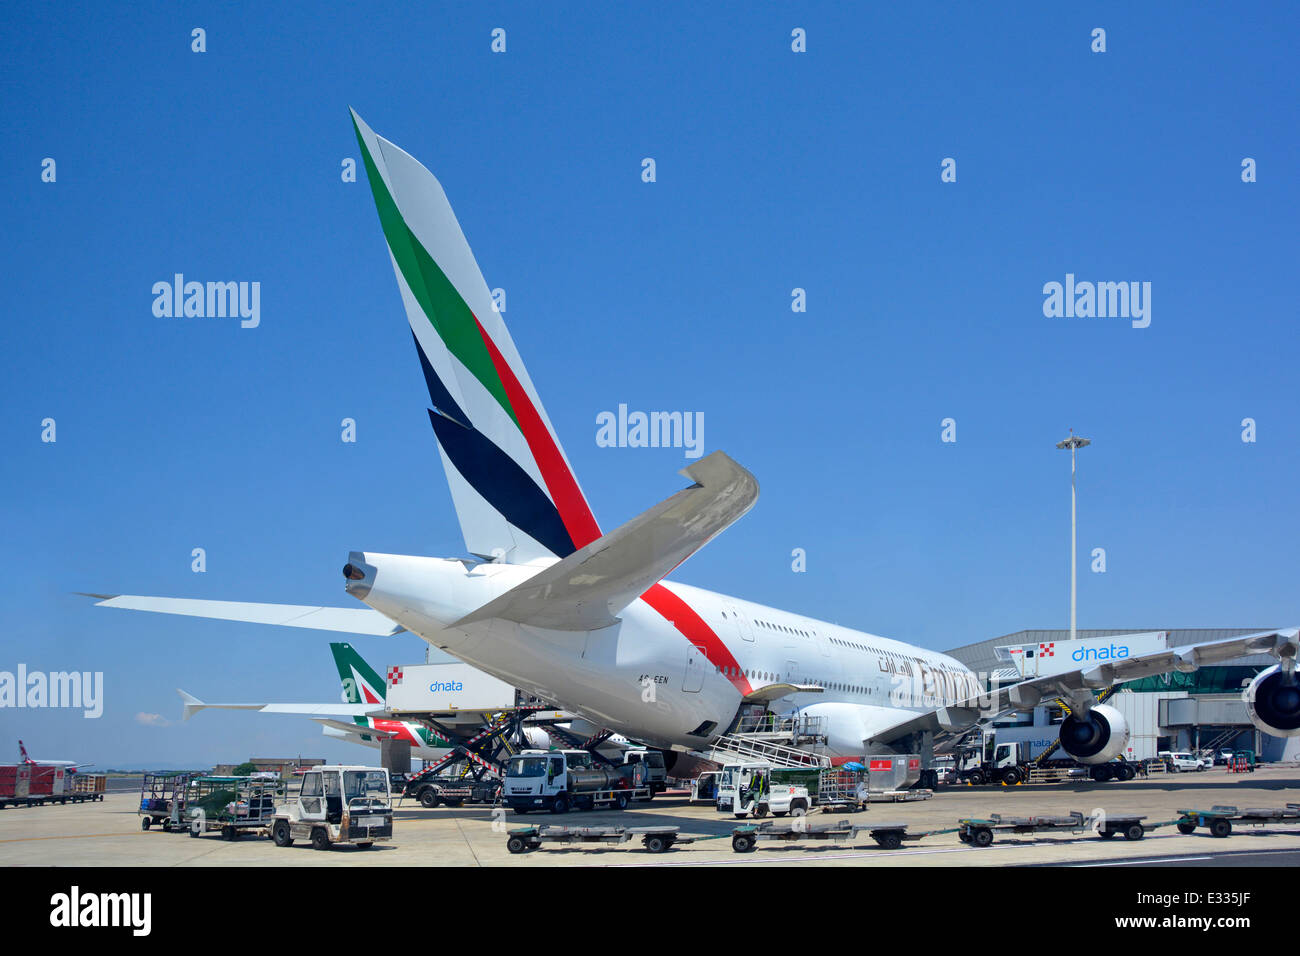 Emirates Airline Stock Photos & Emirates Airline Stock Images - Alamy